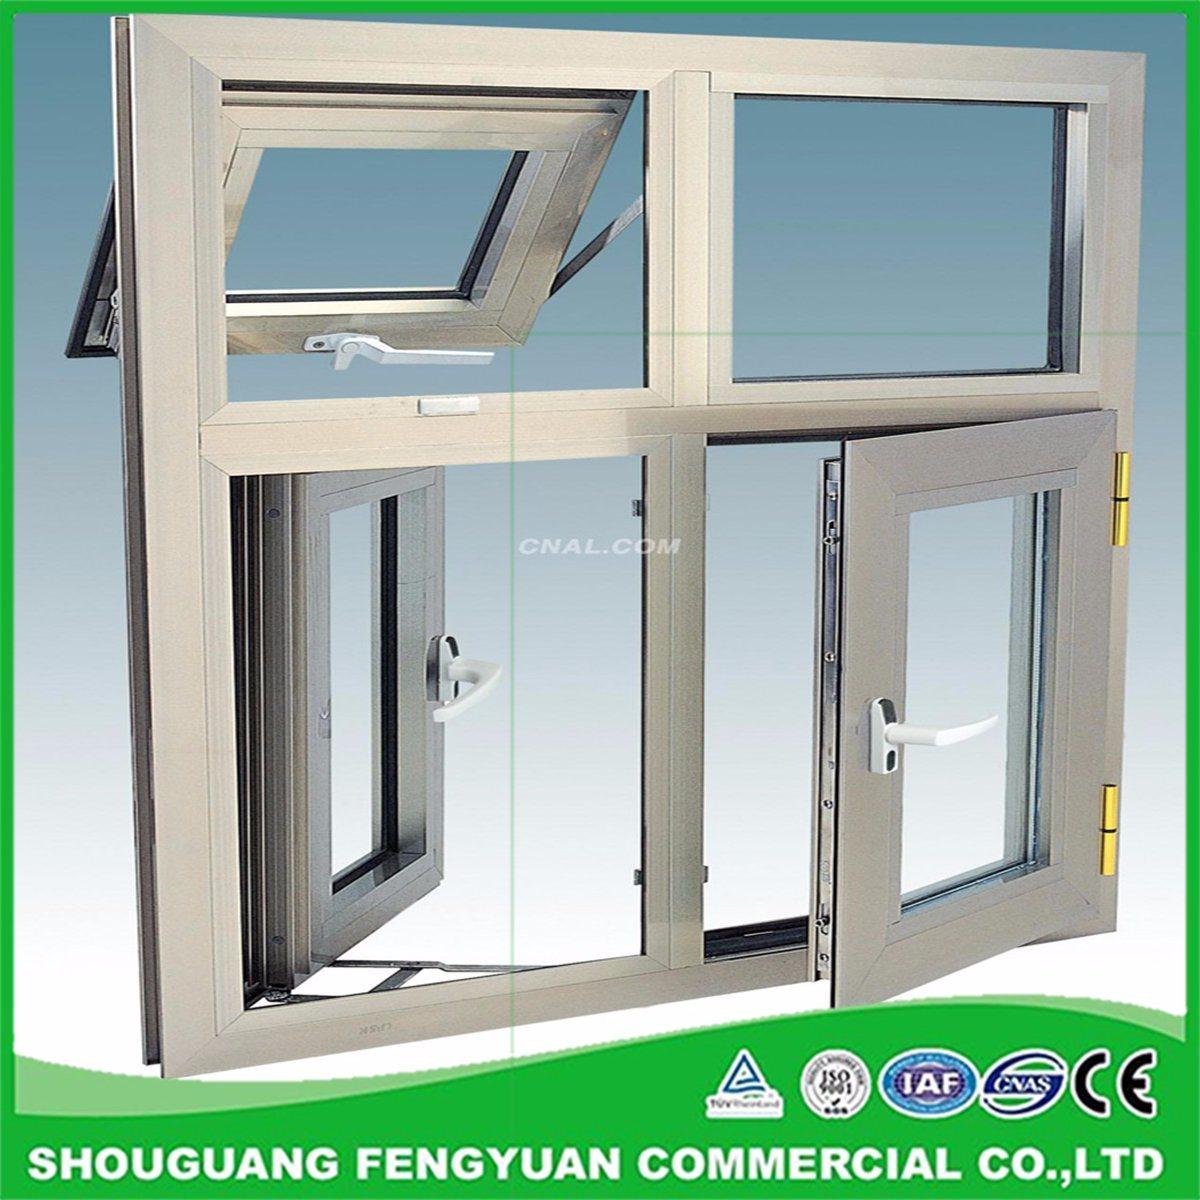 Energy-saving glass for plastic windows 74